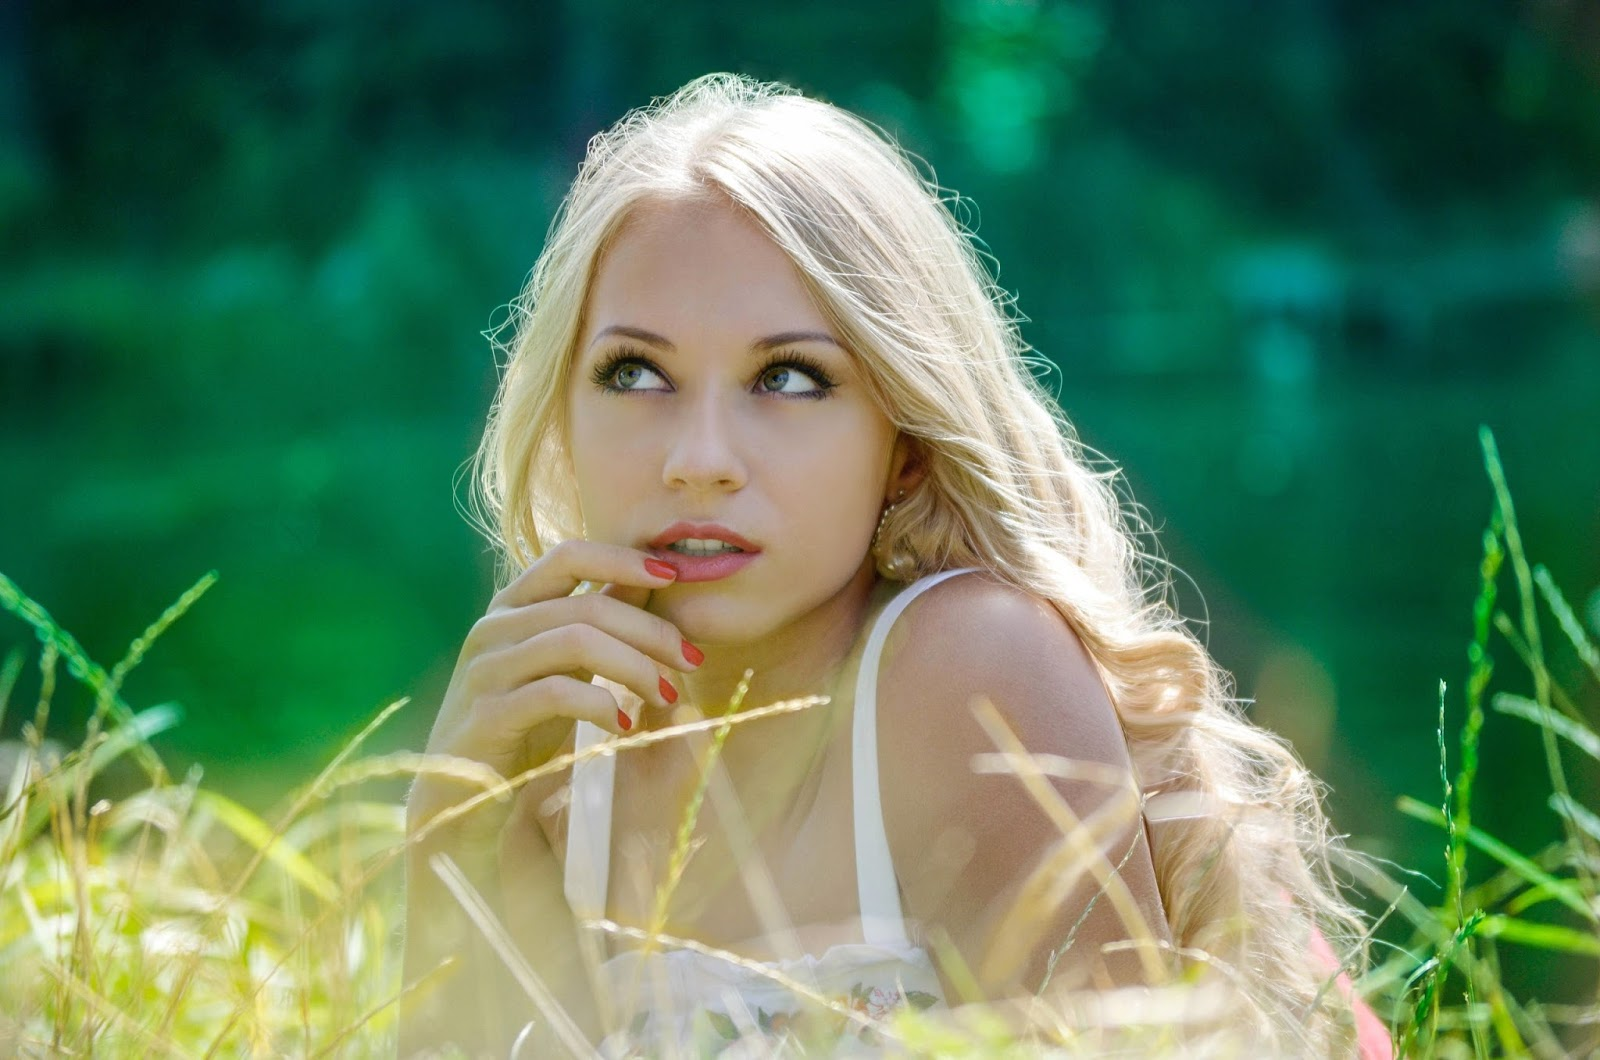 elena-americans-marry-russian-girl-porn-bus-hidden-cam